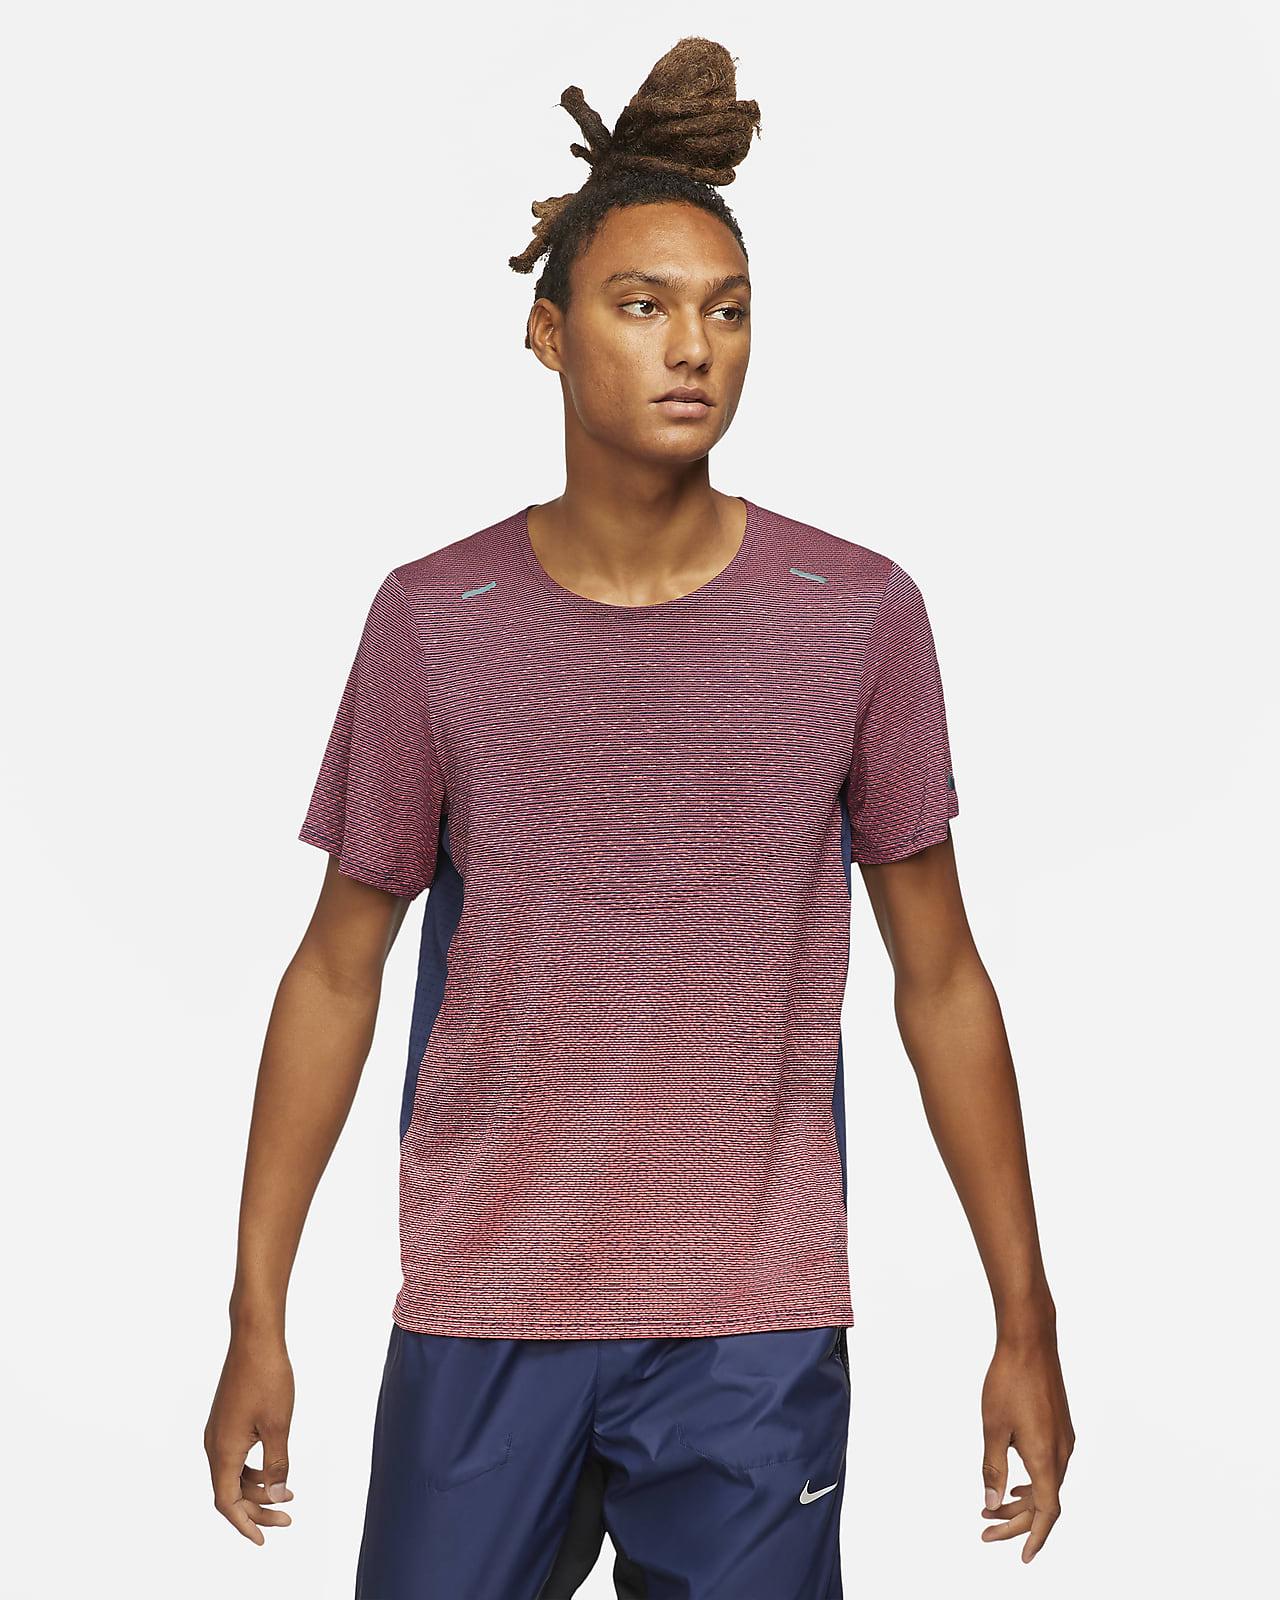 Мужская беговая футболка с коротким рукавом Nike Pinnacle Run Division